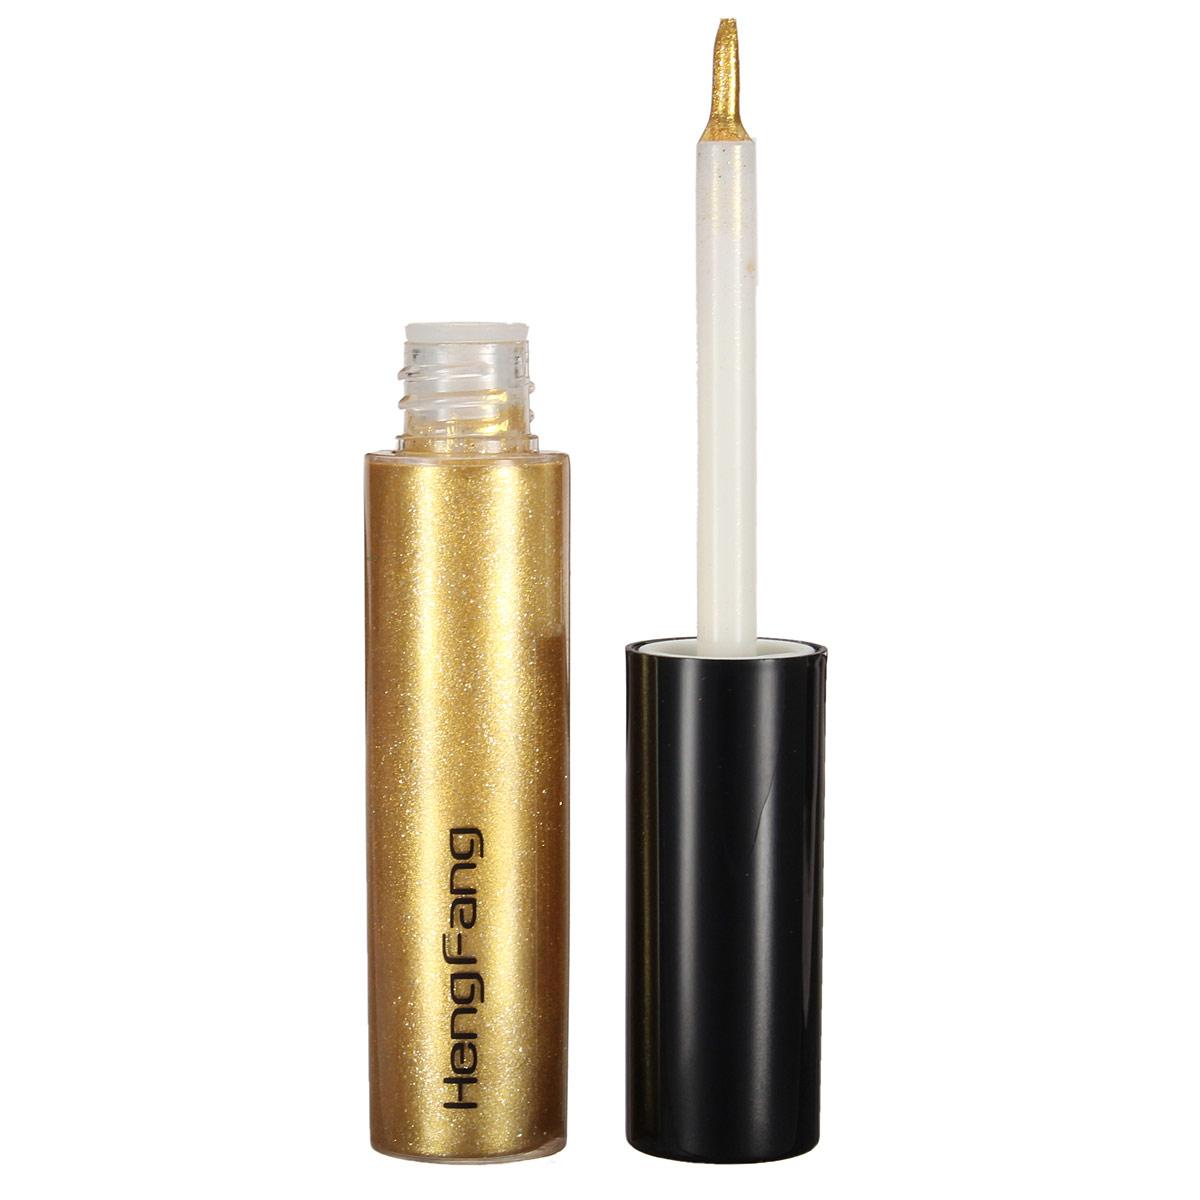 Wedding Makeup Liquid Eyeliner : Glitter Waterproof Liquid Eyeliner Starry Sexy Eye Party ...